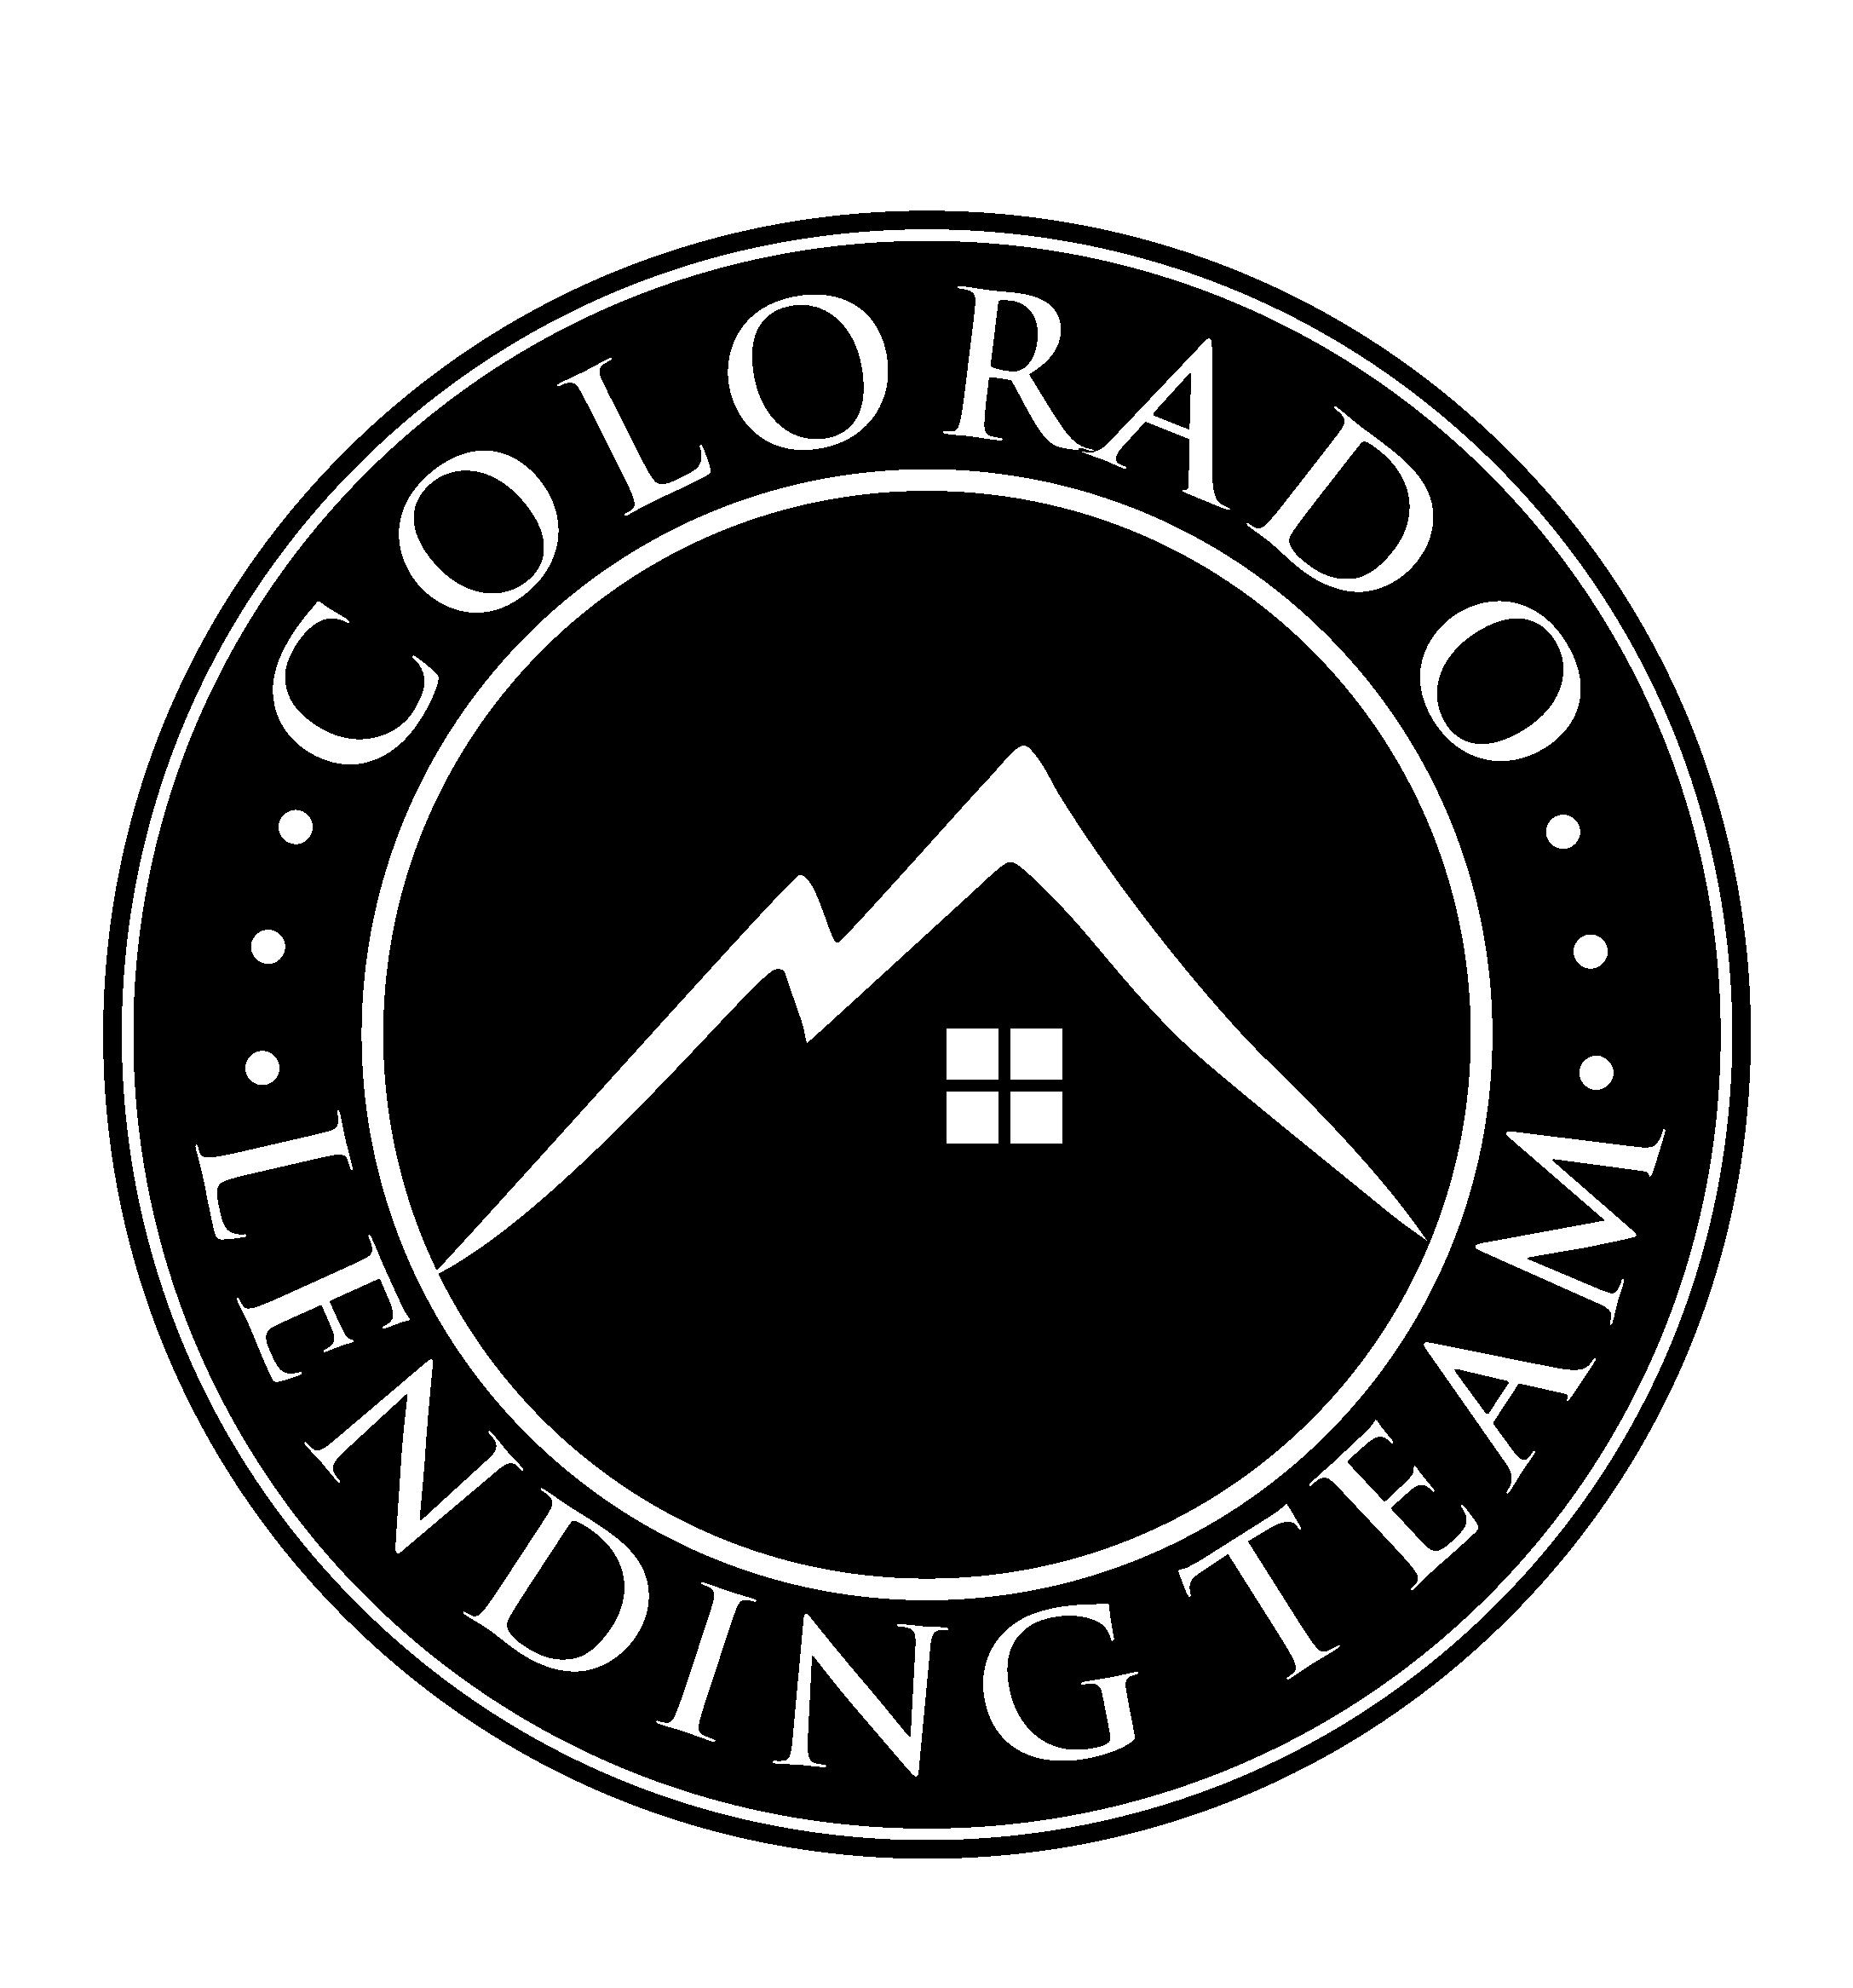 Colorado Lending Team logo